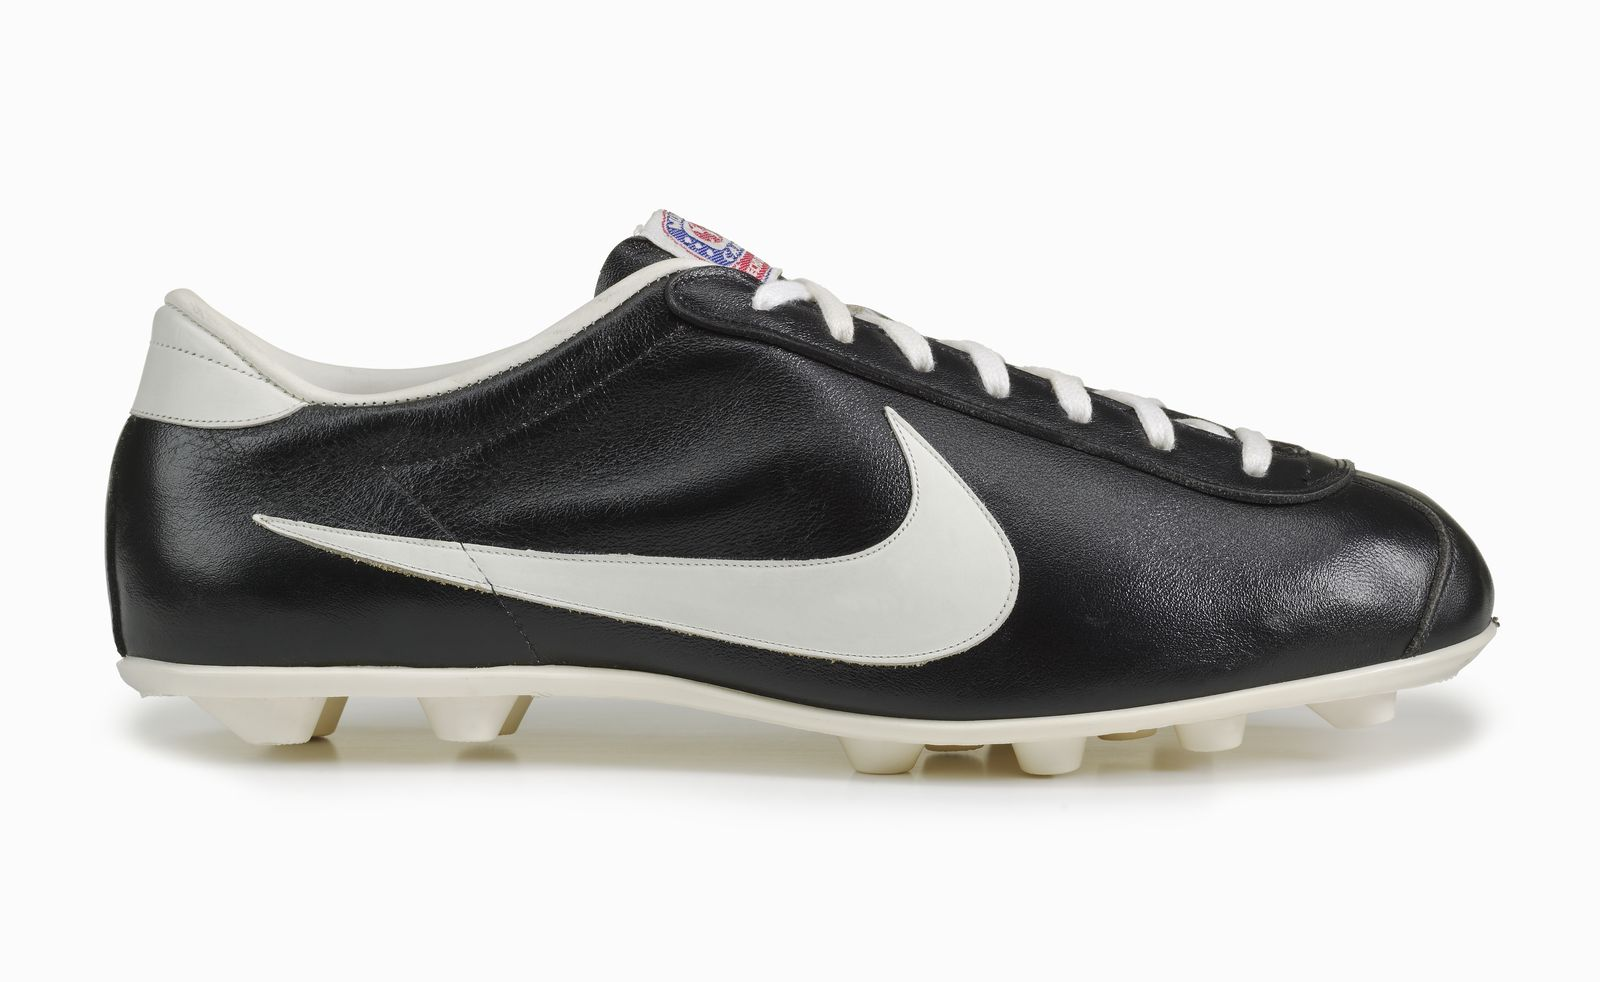 Nike Shoes Old Models